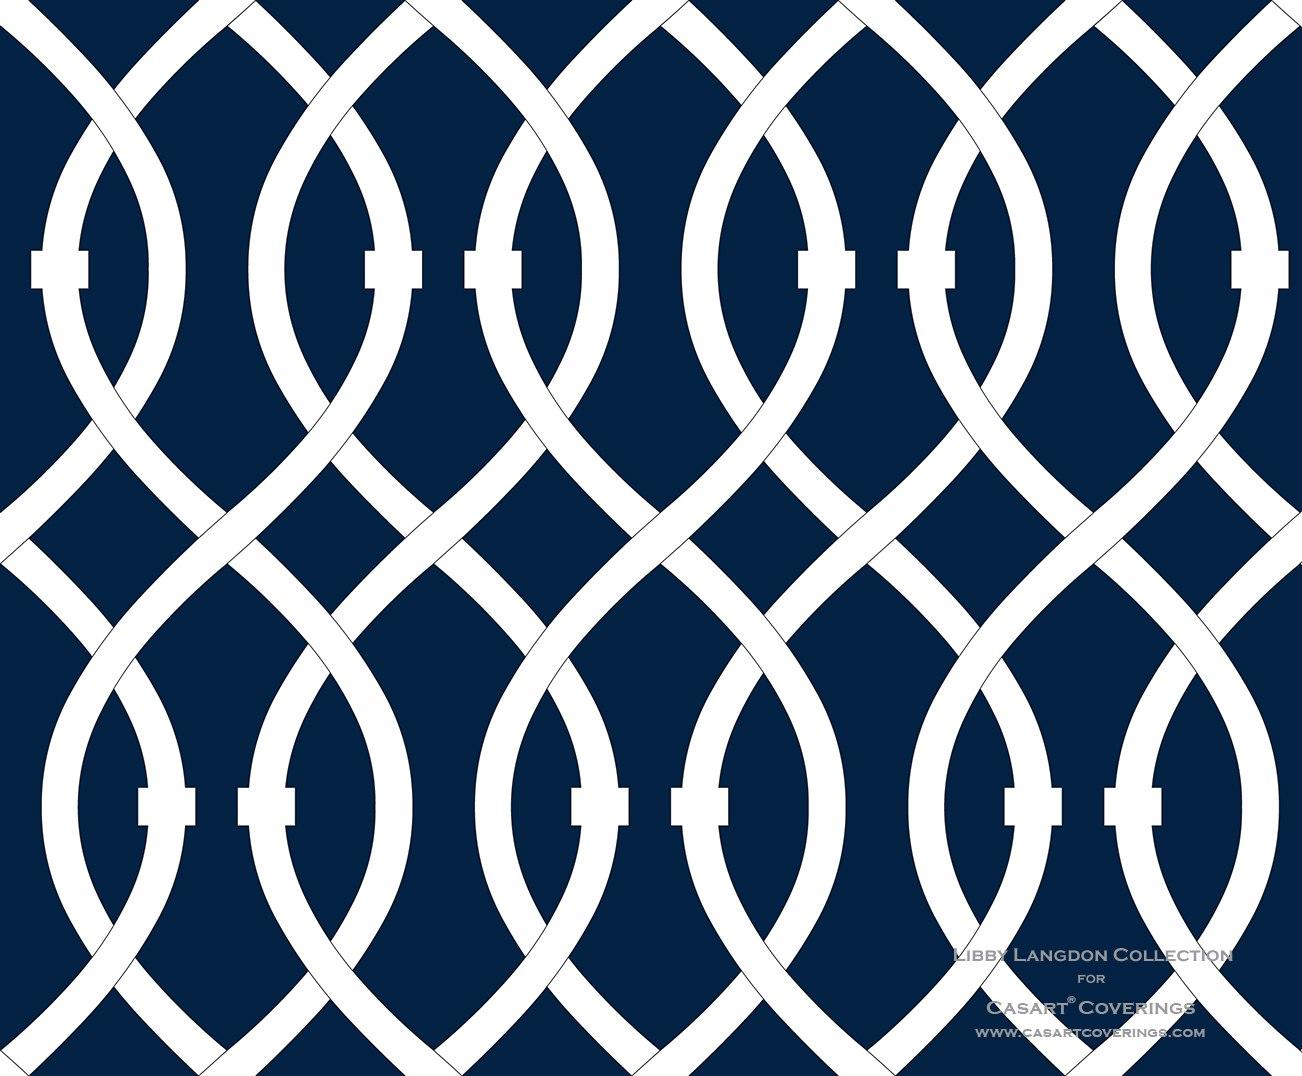 Moroccan Lattice Pattern Wallpaper Libby langdon lively lattice 1302x1076